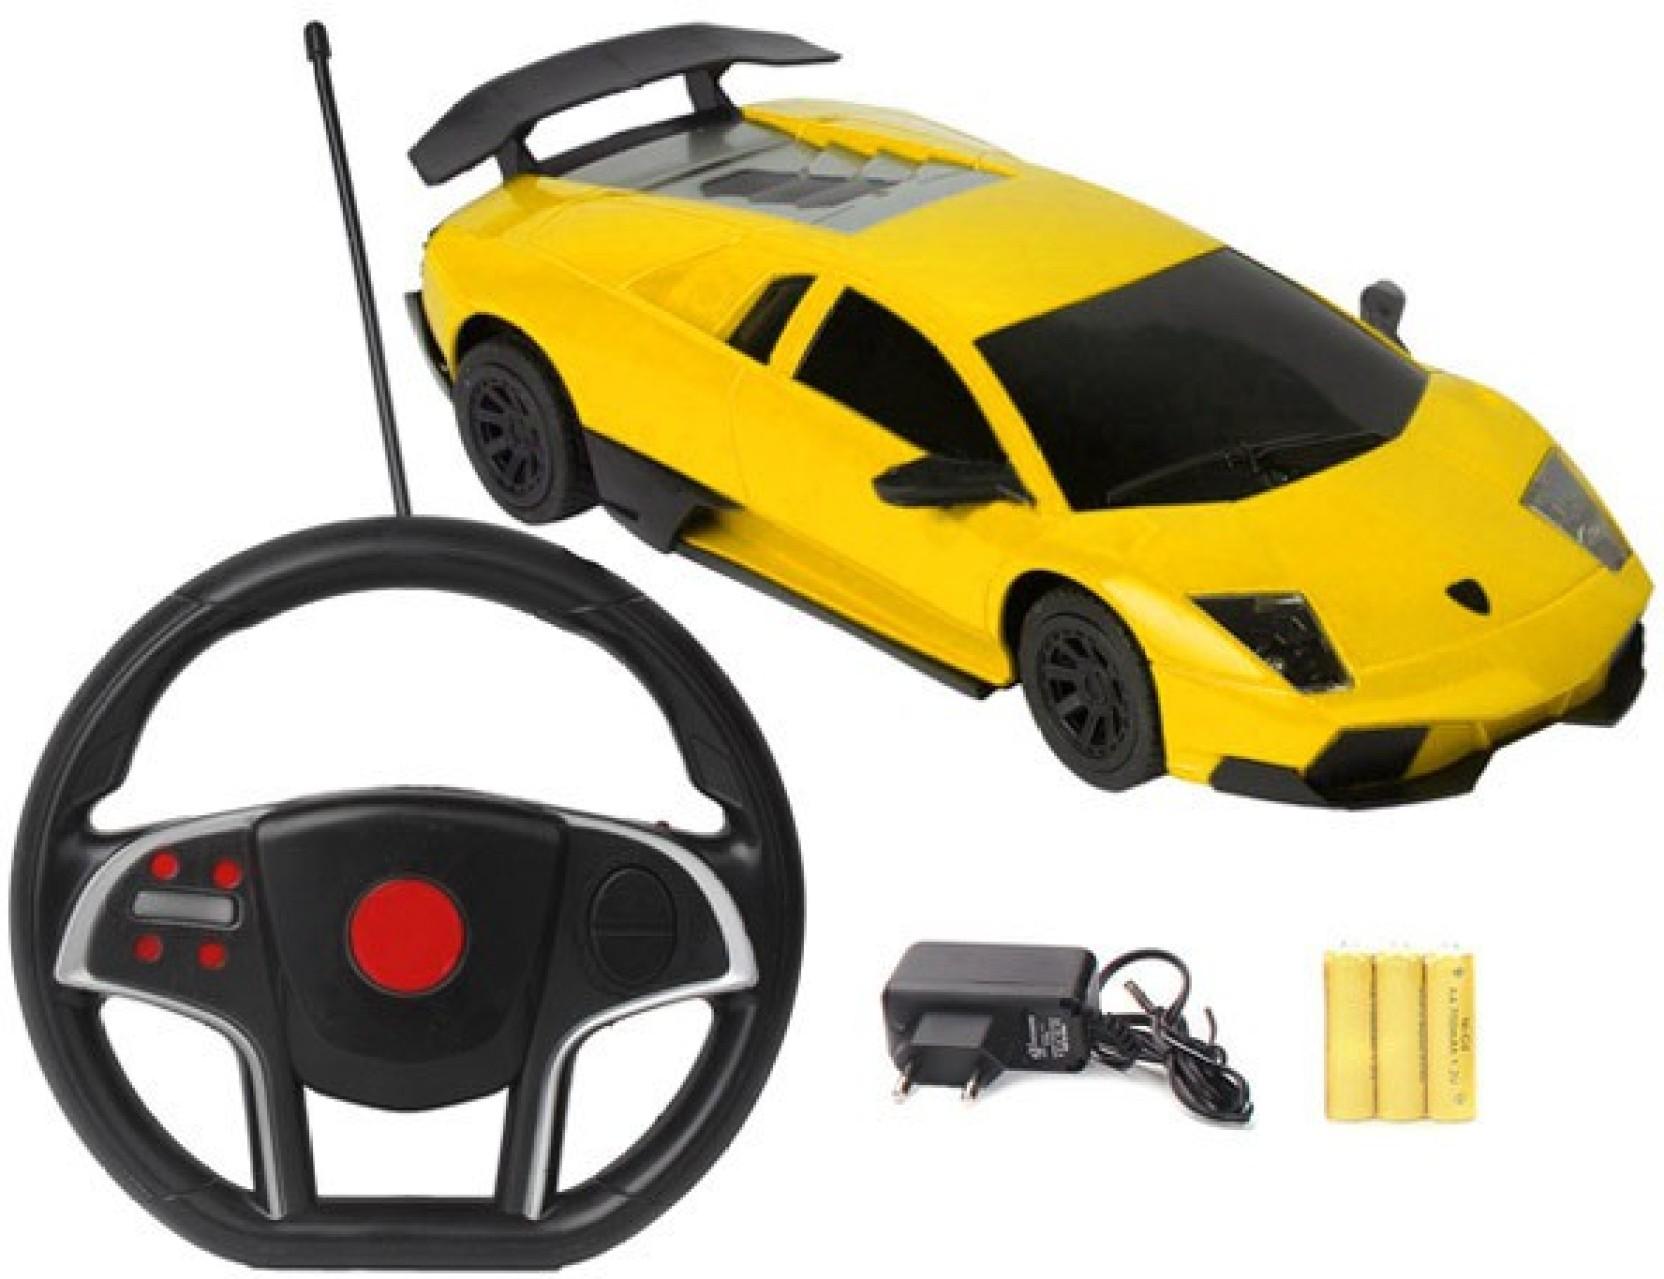 Ar Enterprises Lamborghini Remote Control Rechargeable Toy Car With Gravity Sensing Multi Add To Cart